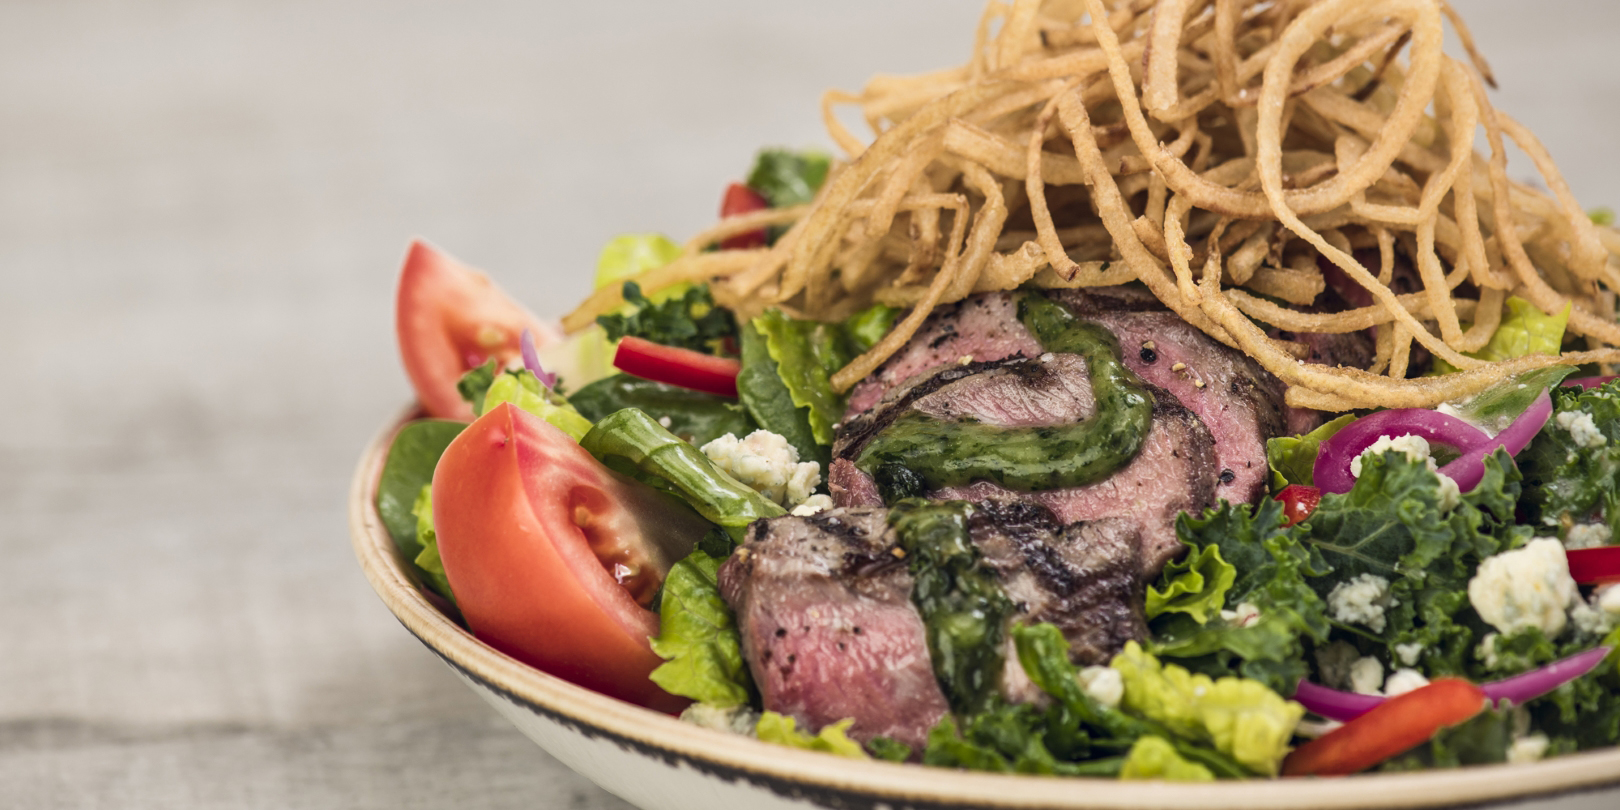 Steaks Salad from Hard Rock Cafe Bangkok in Siam Square Soi 11, Bangkok